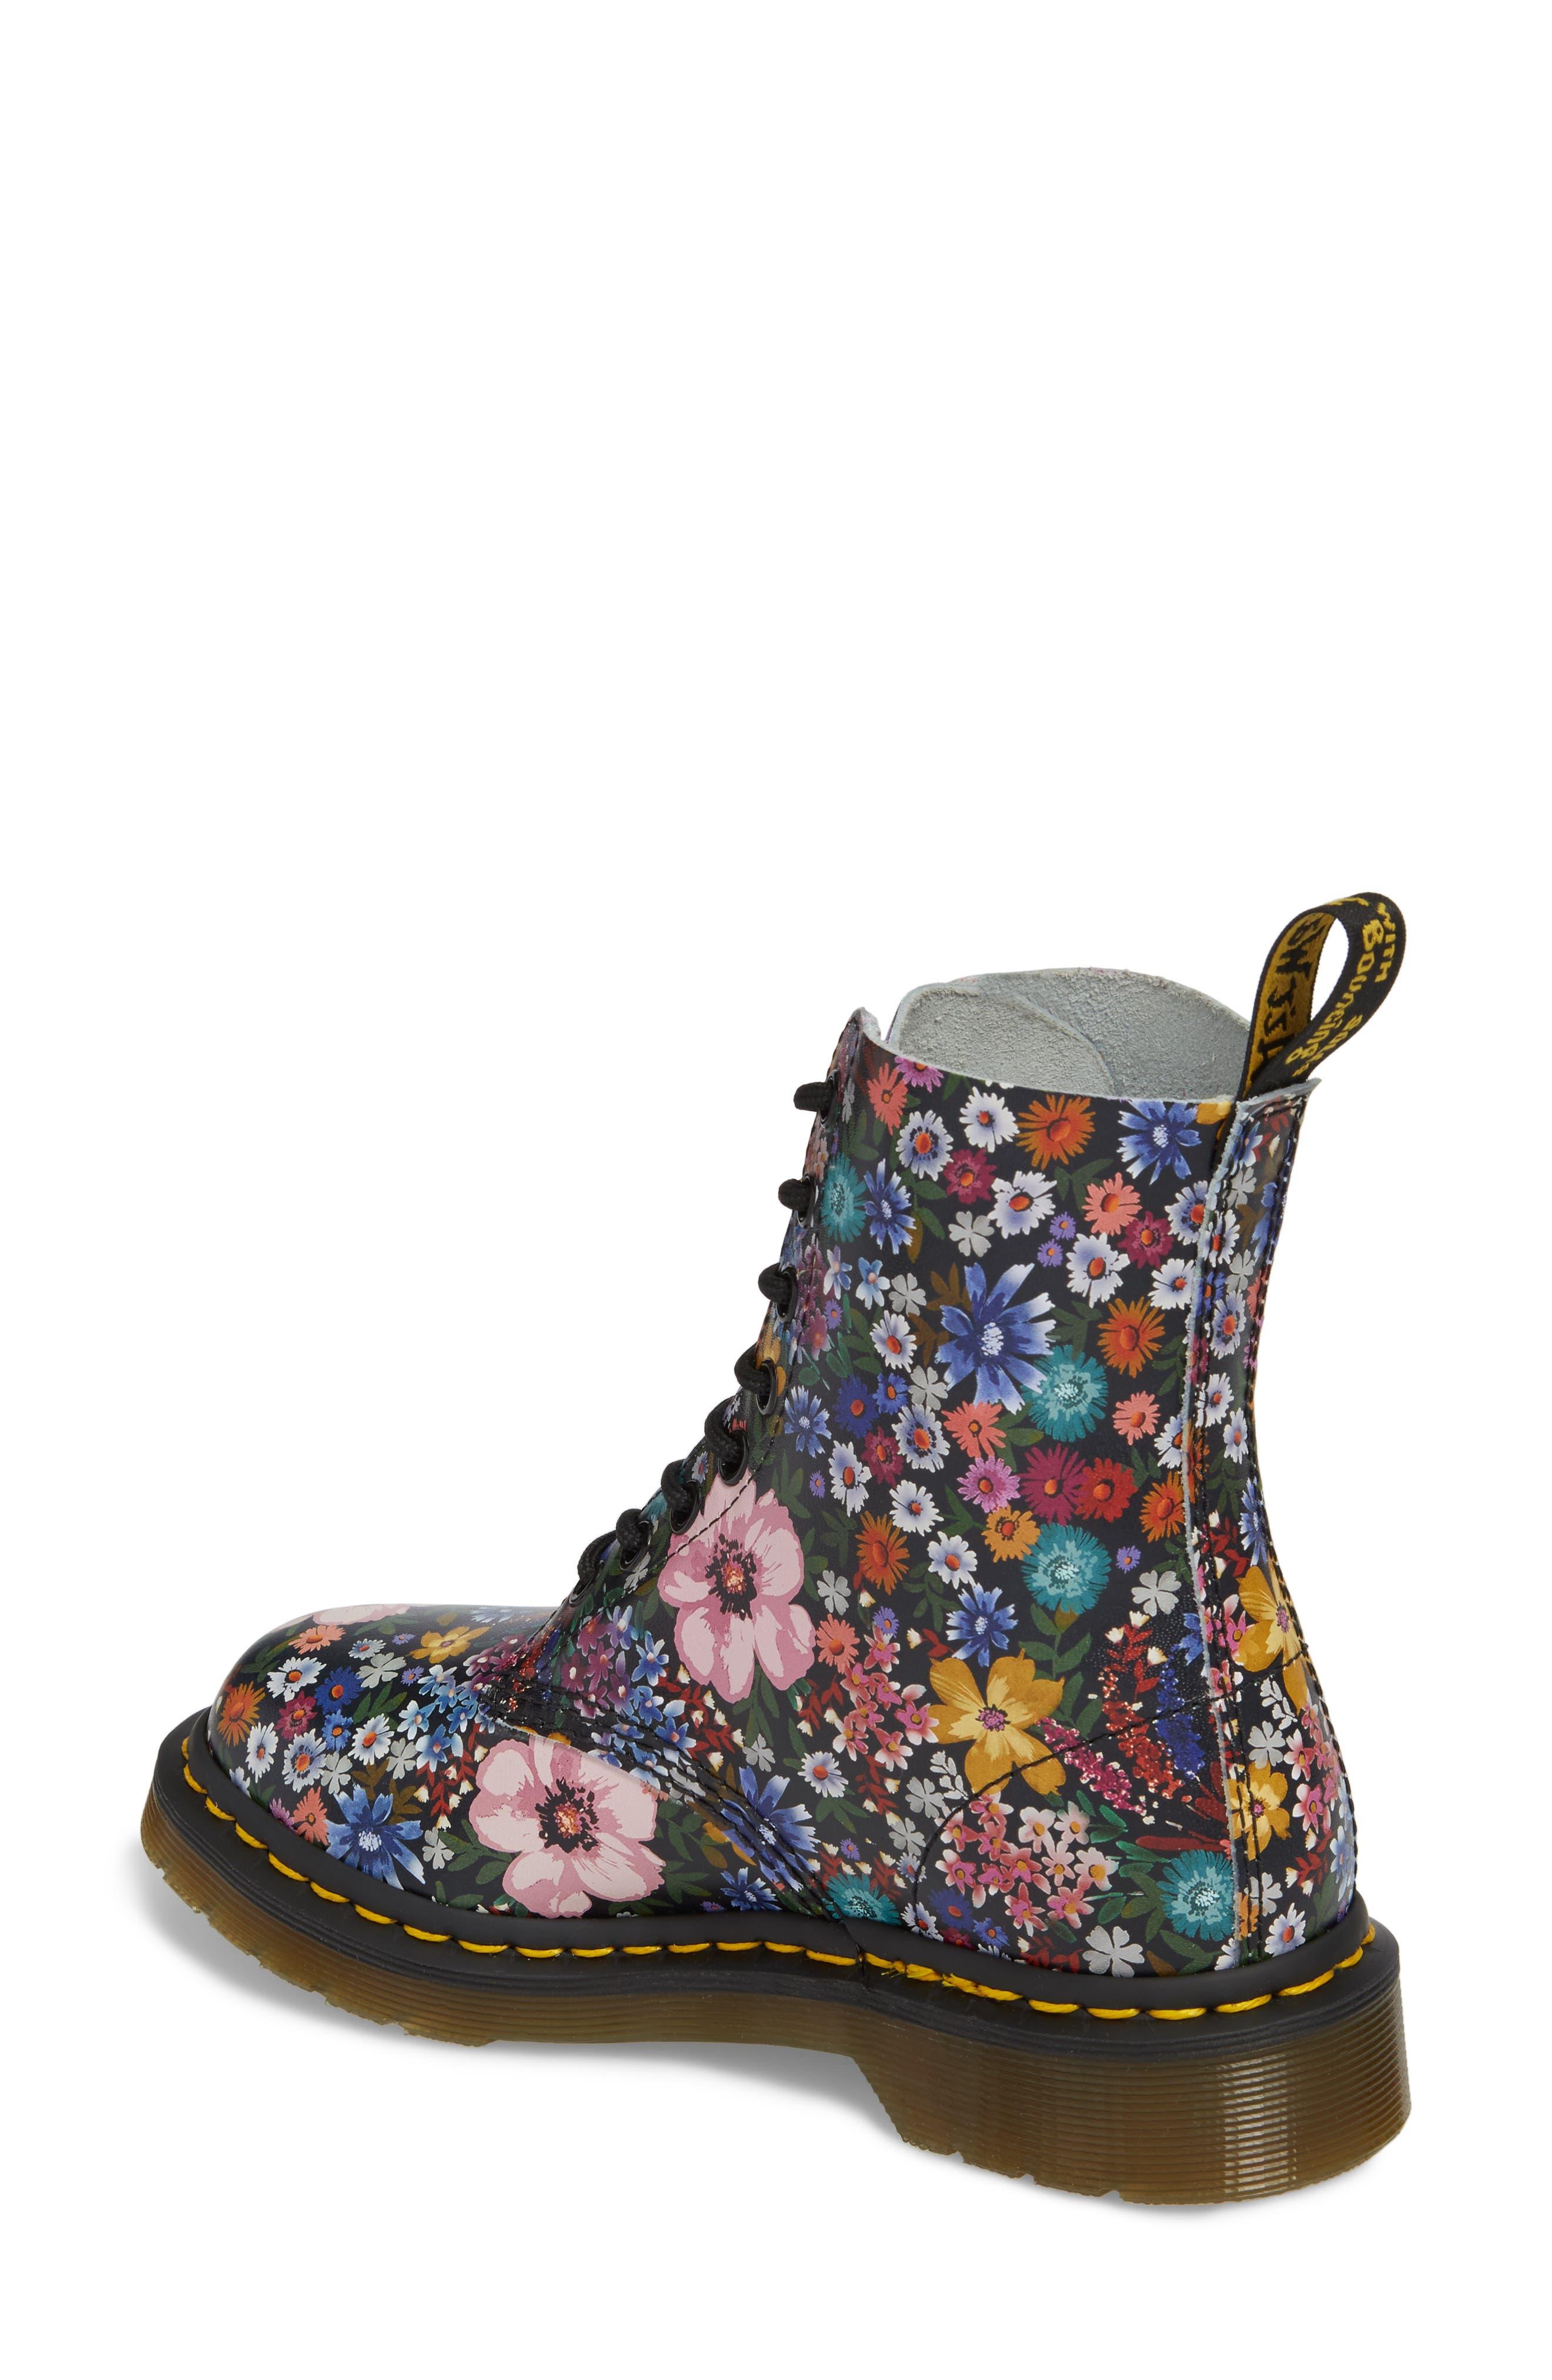 Pascal Wanderlust Boot,                             Alternate thumbnail 2, color,                             Black Floral Leather